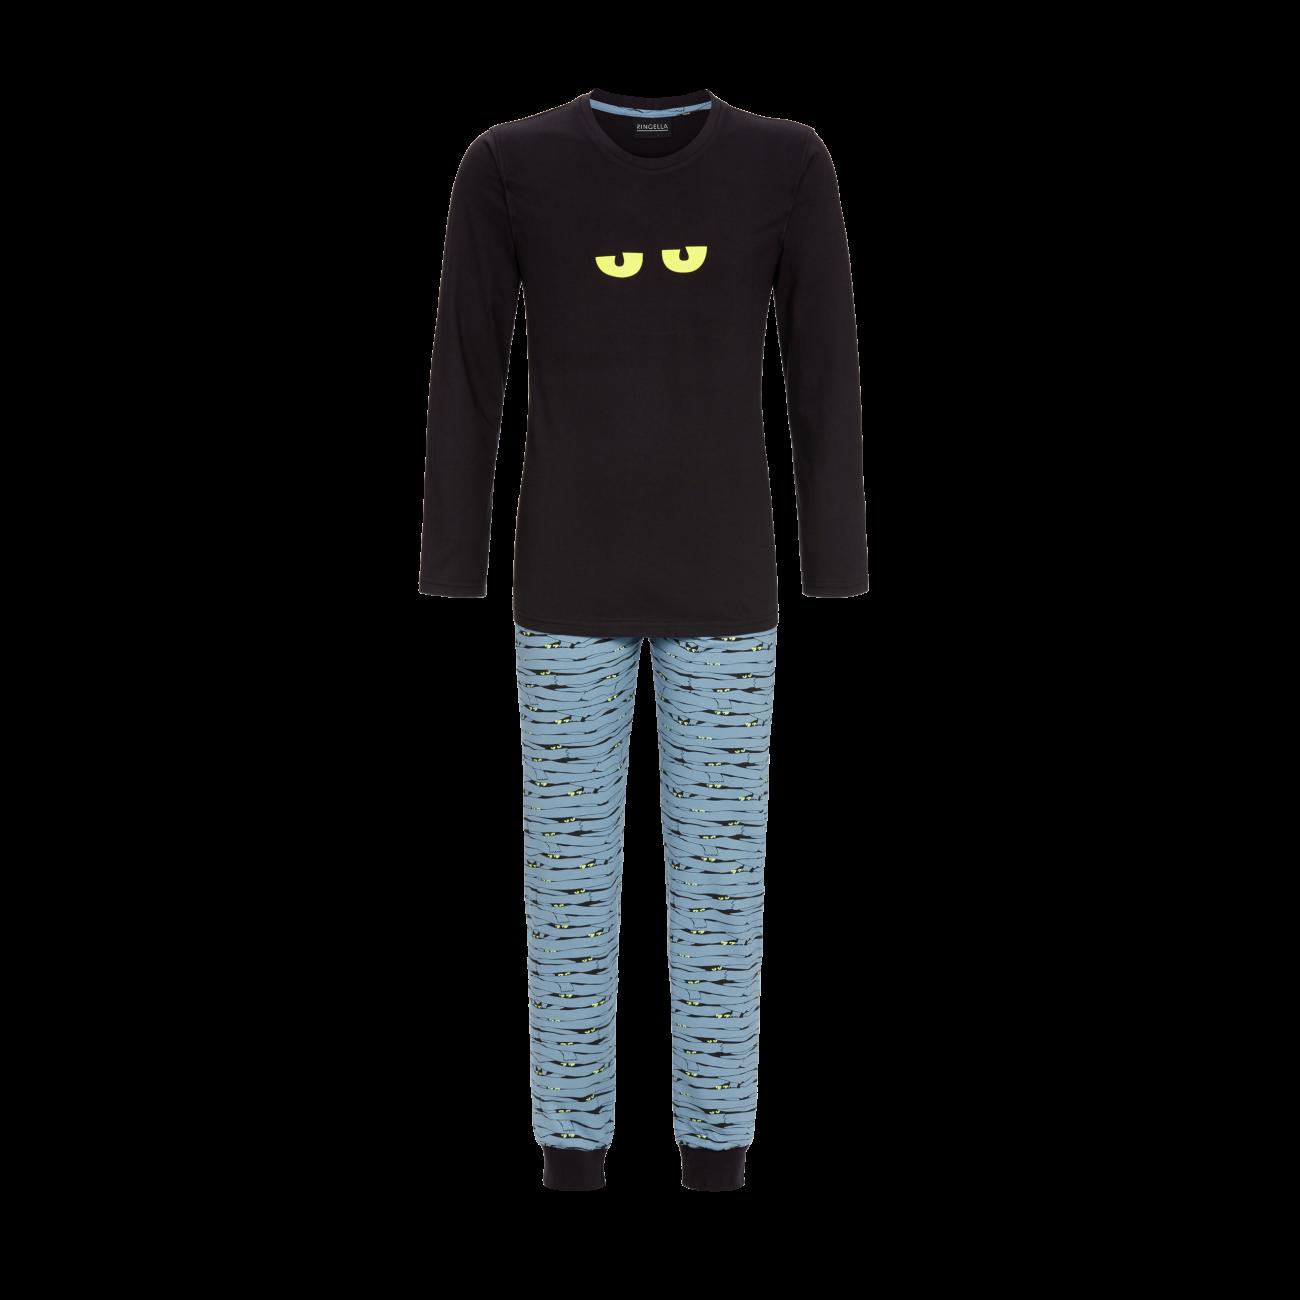 Pyjama mit Motivdruck schwarz   46